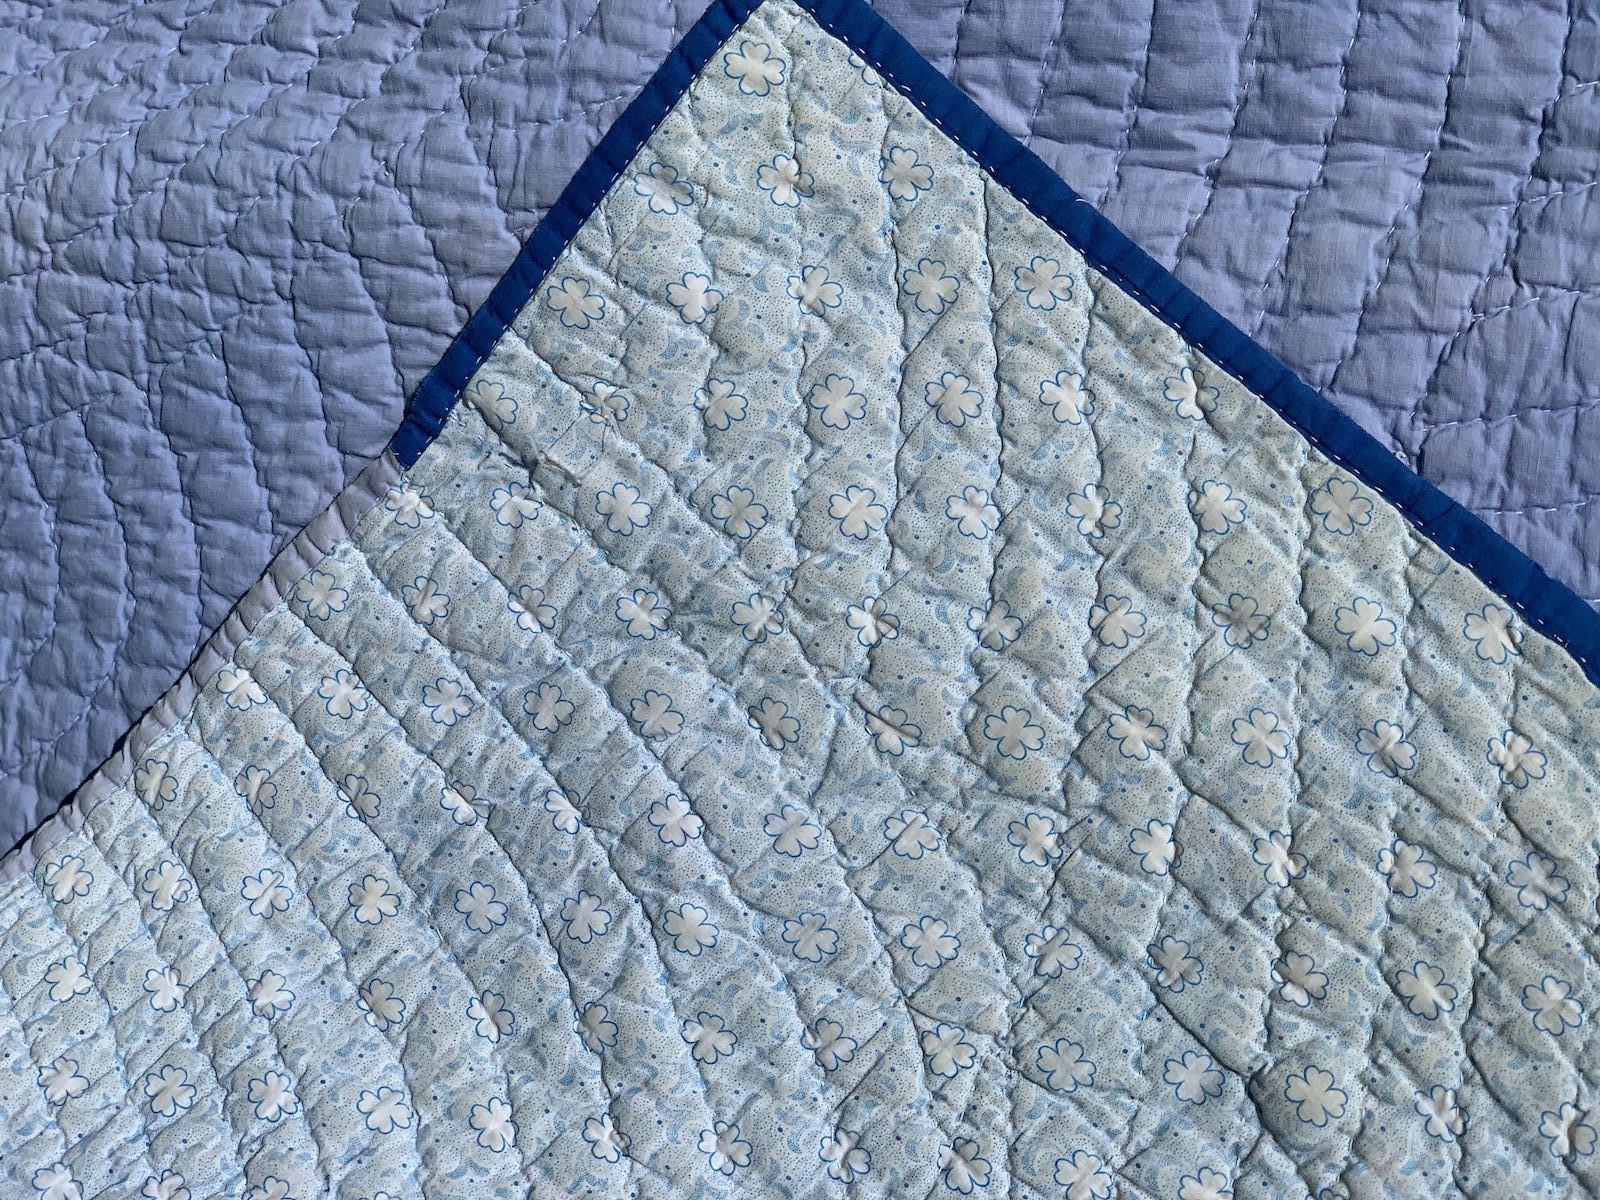 1-corner of quilt flipped over turned